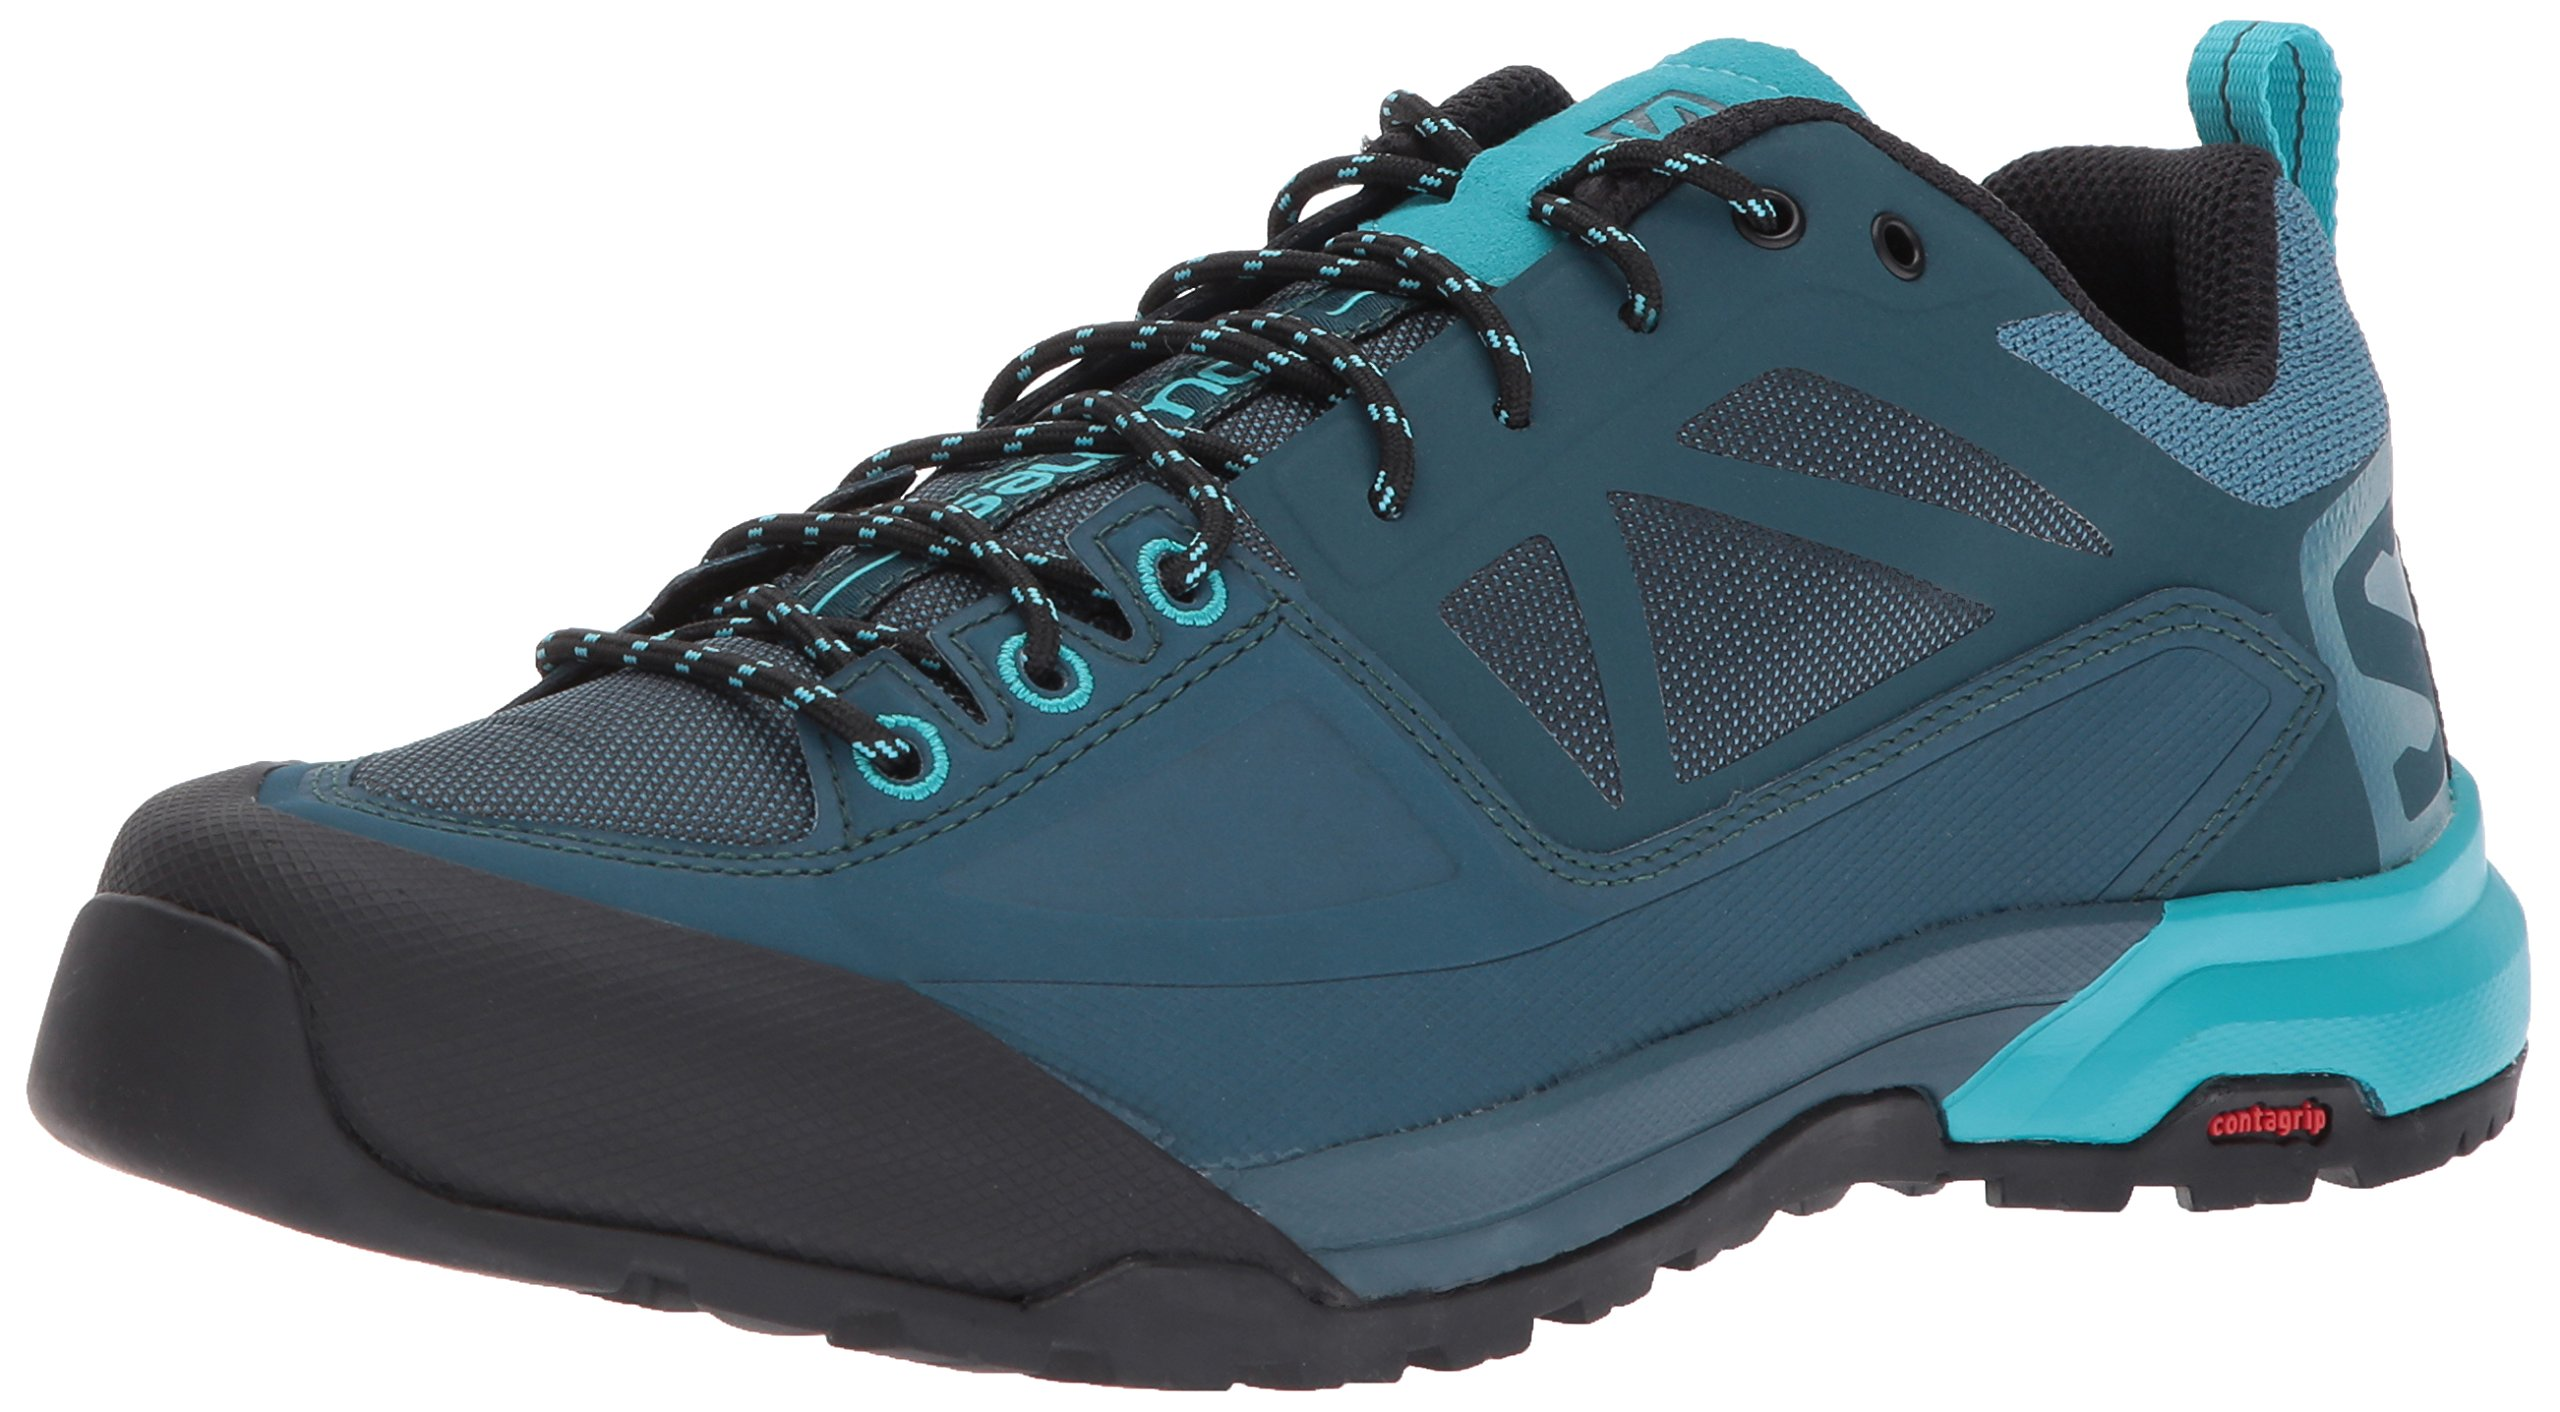 SALOMON Women's X ALP SPRY W Mountaineering Boot, Mallard Reflecting Pond/Blue Bird, 7 M US by SALOMON